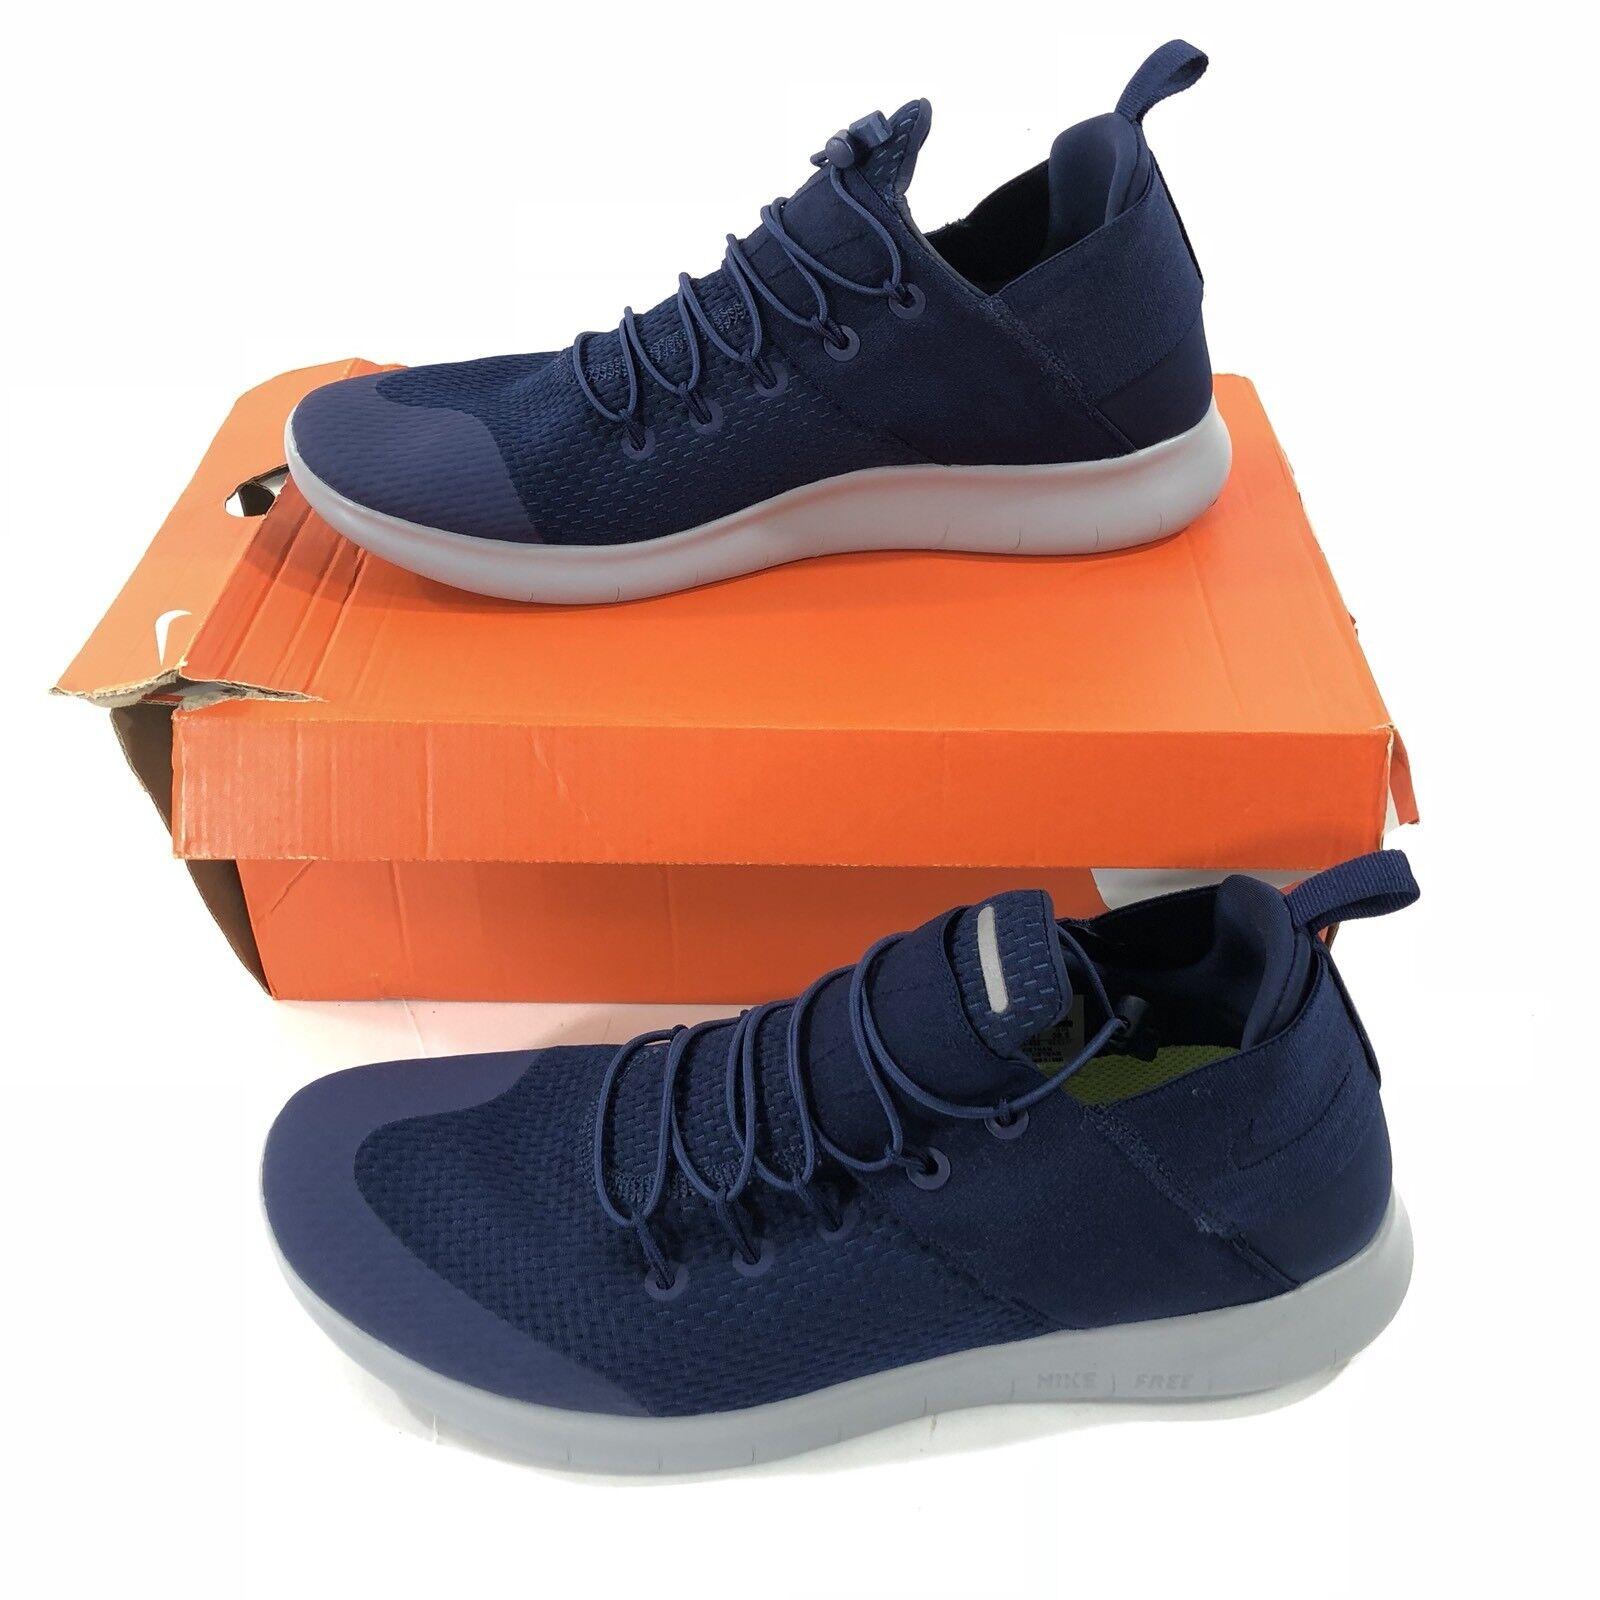 903365effe597 Mens Nike Nike Nike Free RN CMTR 2017 Blue Running Trainers Slip On Shoes  880841 400